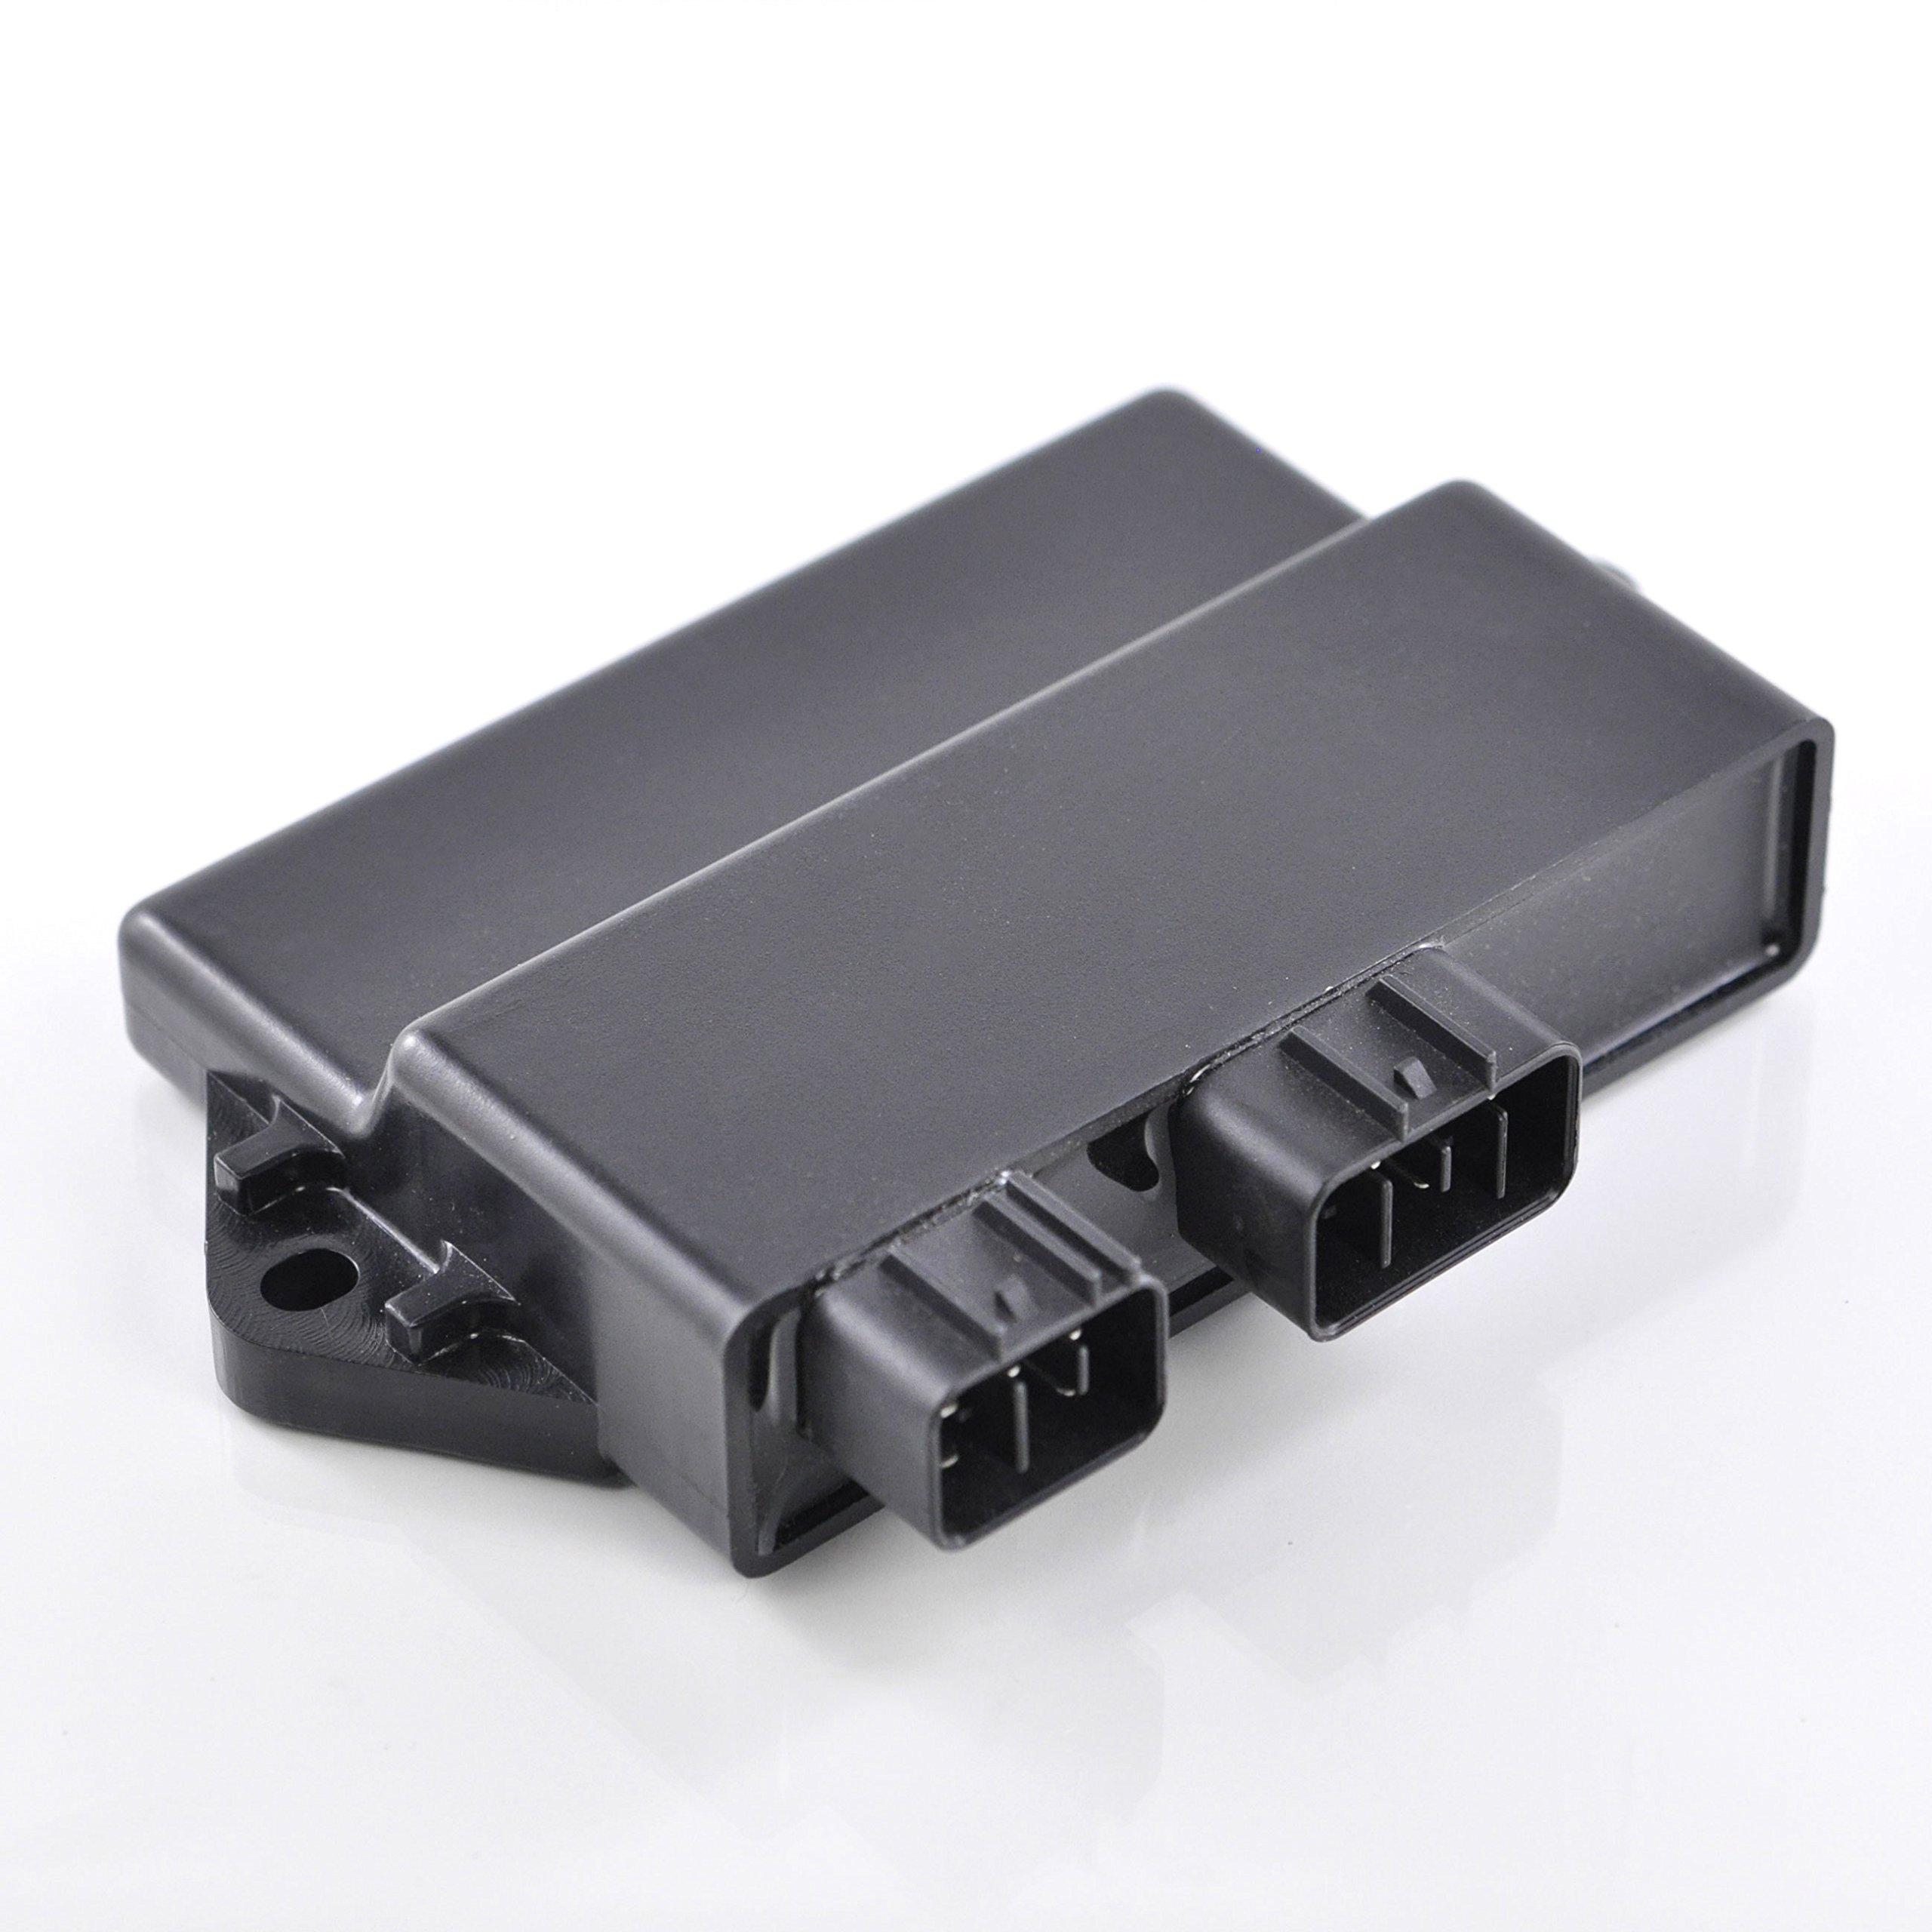 High Performance CDI Box For Yamaha YFM 400 Kodiak 2000 2001 OEM Repl.# 5GH-85540-10-00